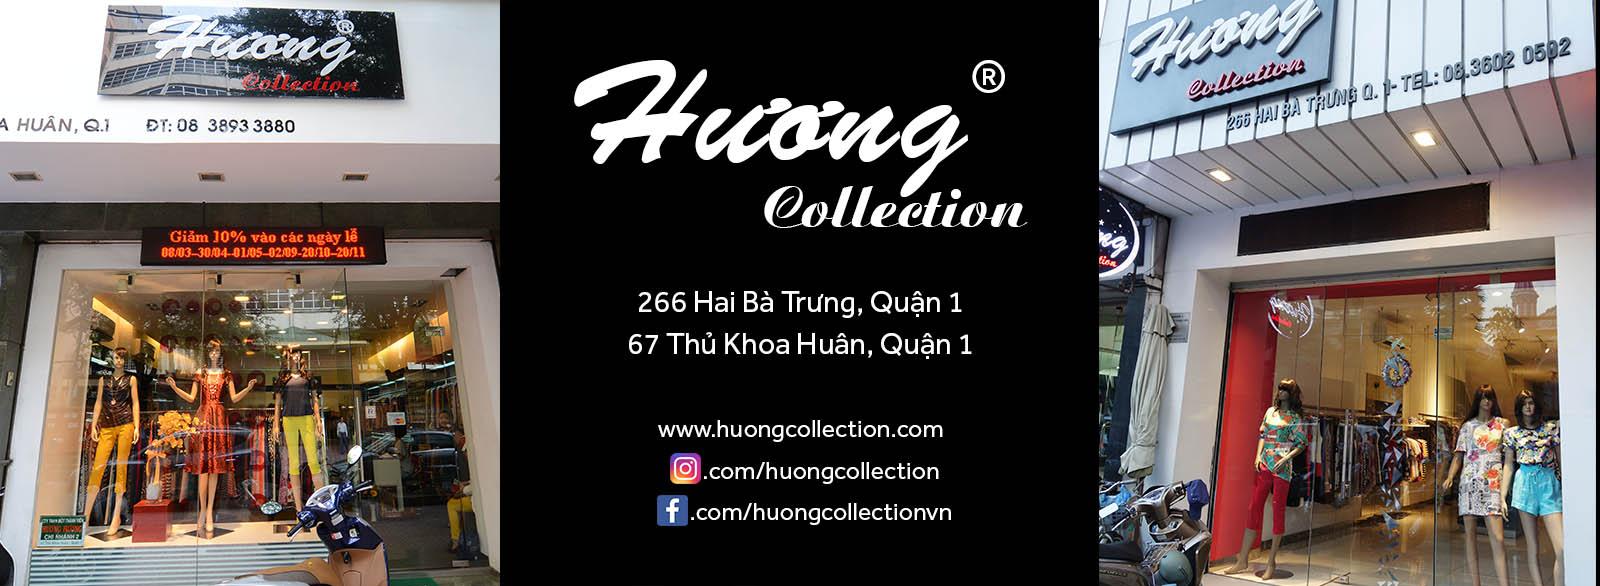 huongcollection-huongcollection.com-banner1